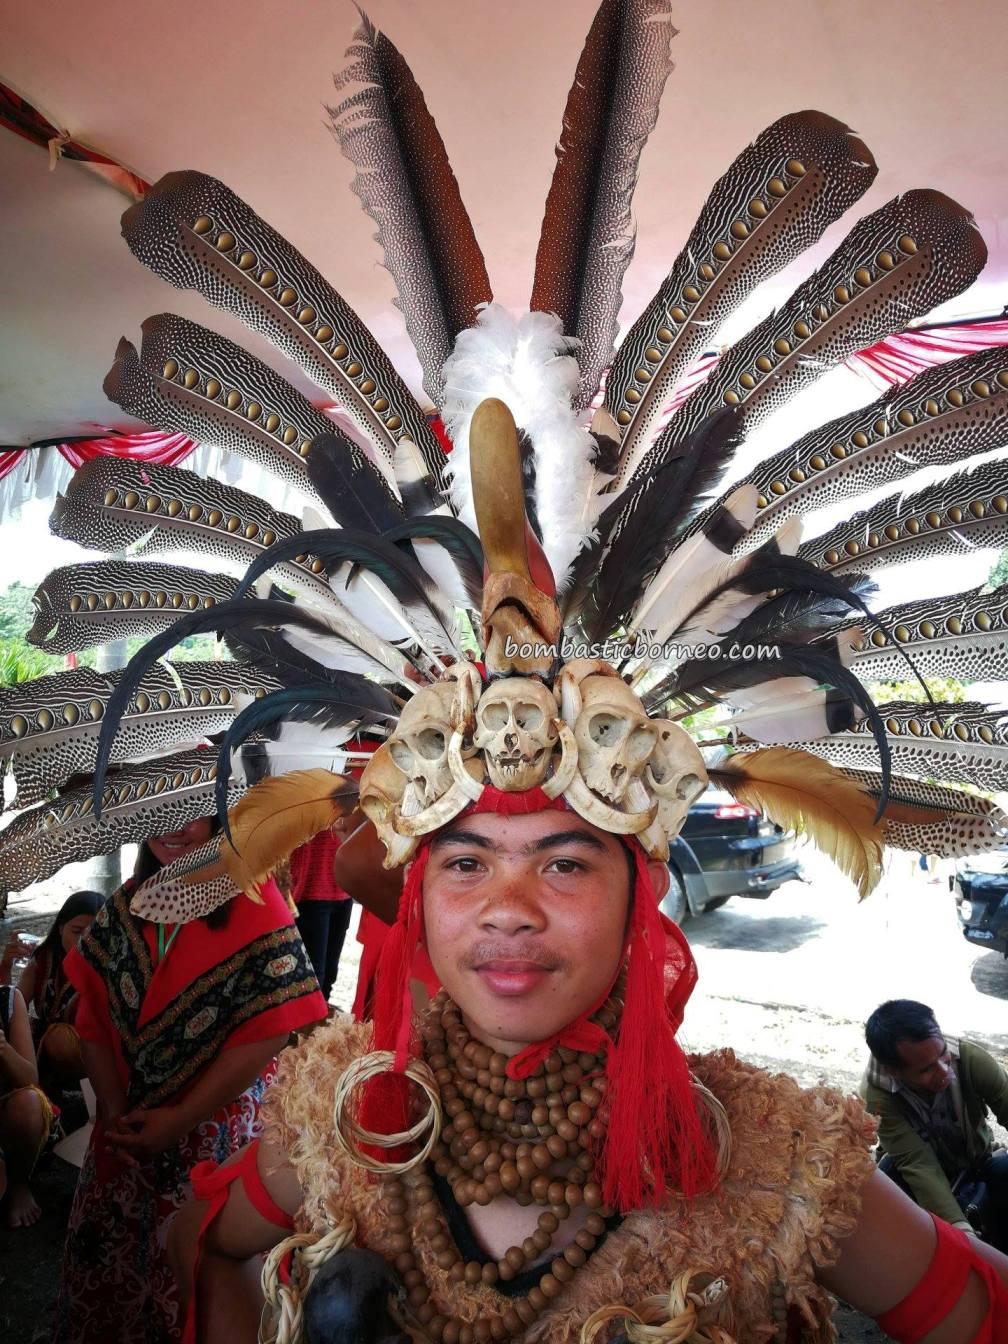 Gawai Sanggau, paddy harvest festival, thanksgiving, authentic, traditional, destination, event, Indonesia, ethnic, tribe, Tourism, tourist attraction, cross border, 印尼西加里曼丹, 婆罗洲达雅克丰收节旅游